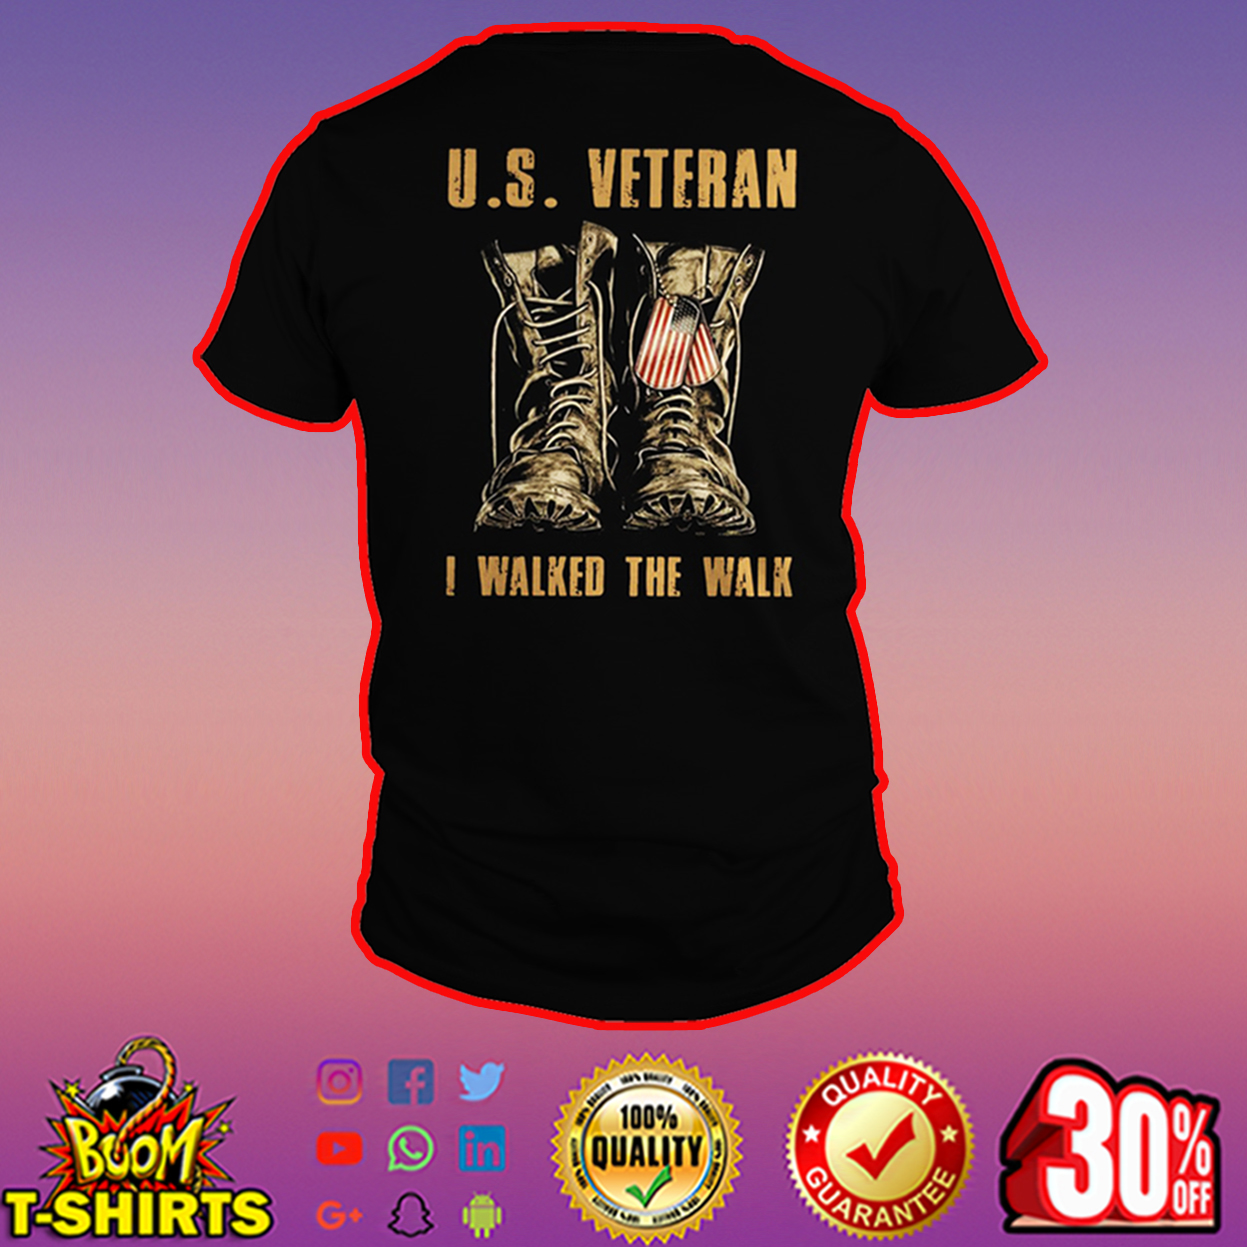 U.S. Veteran I walked the walk shirt